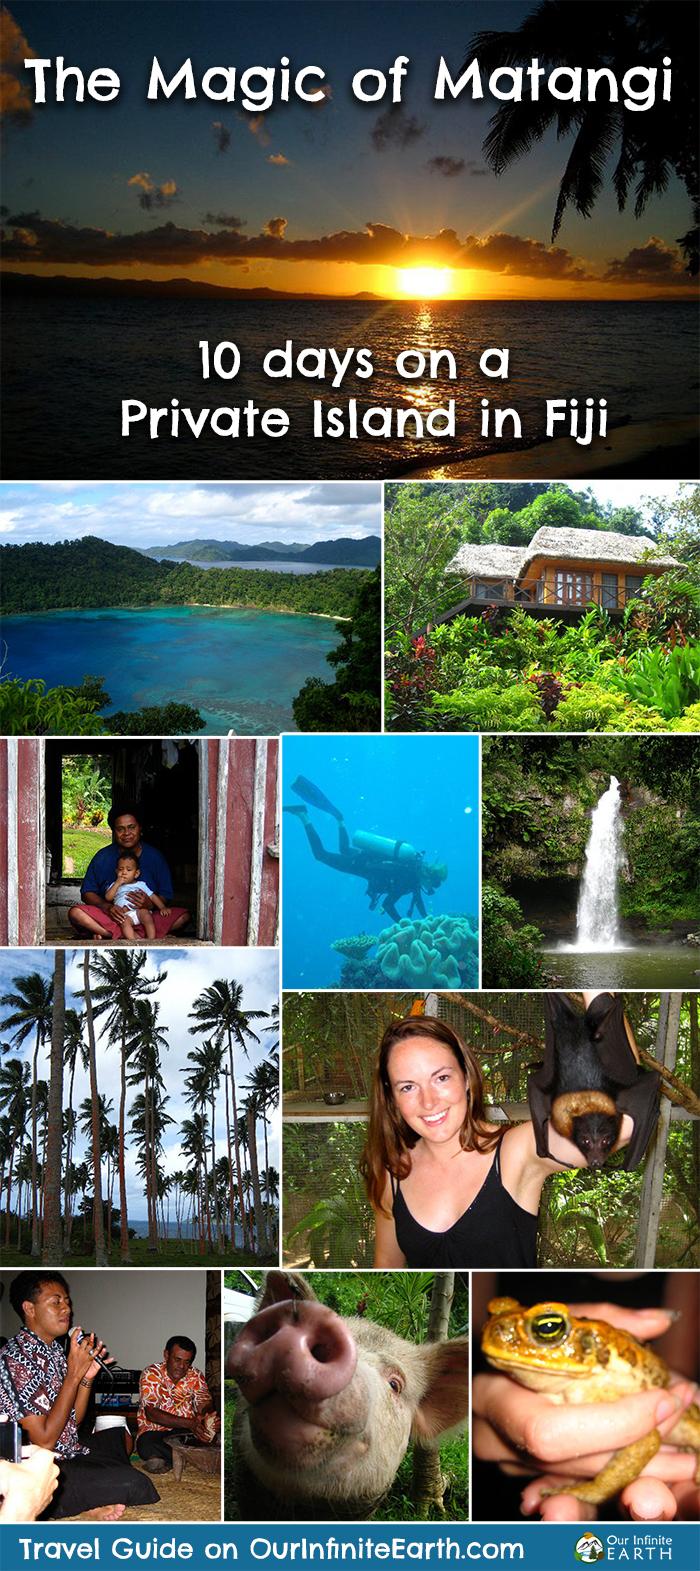 matangi-private-island-resort-fiji-review-guide